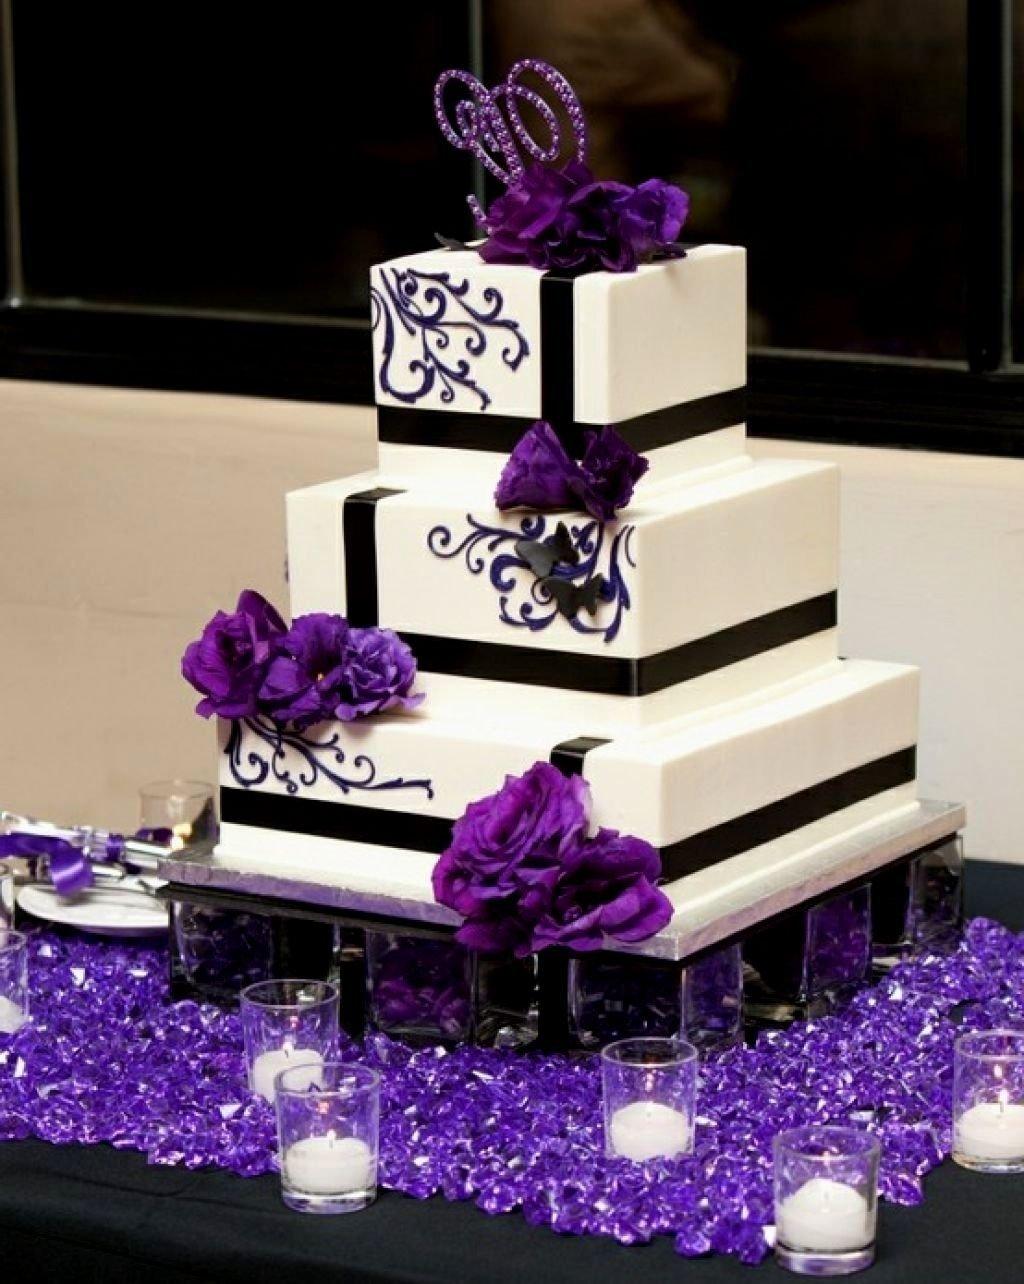 10 Trendy Purple And White Wedding Ideas purple and white wedding ideas decorating of party 50th anniversary 2021